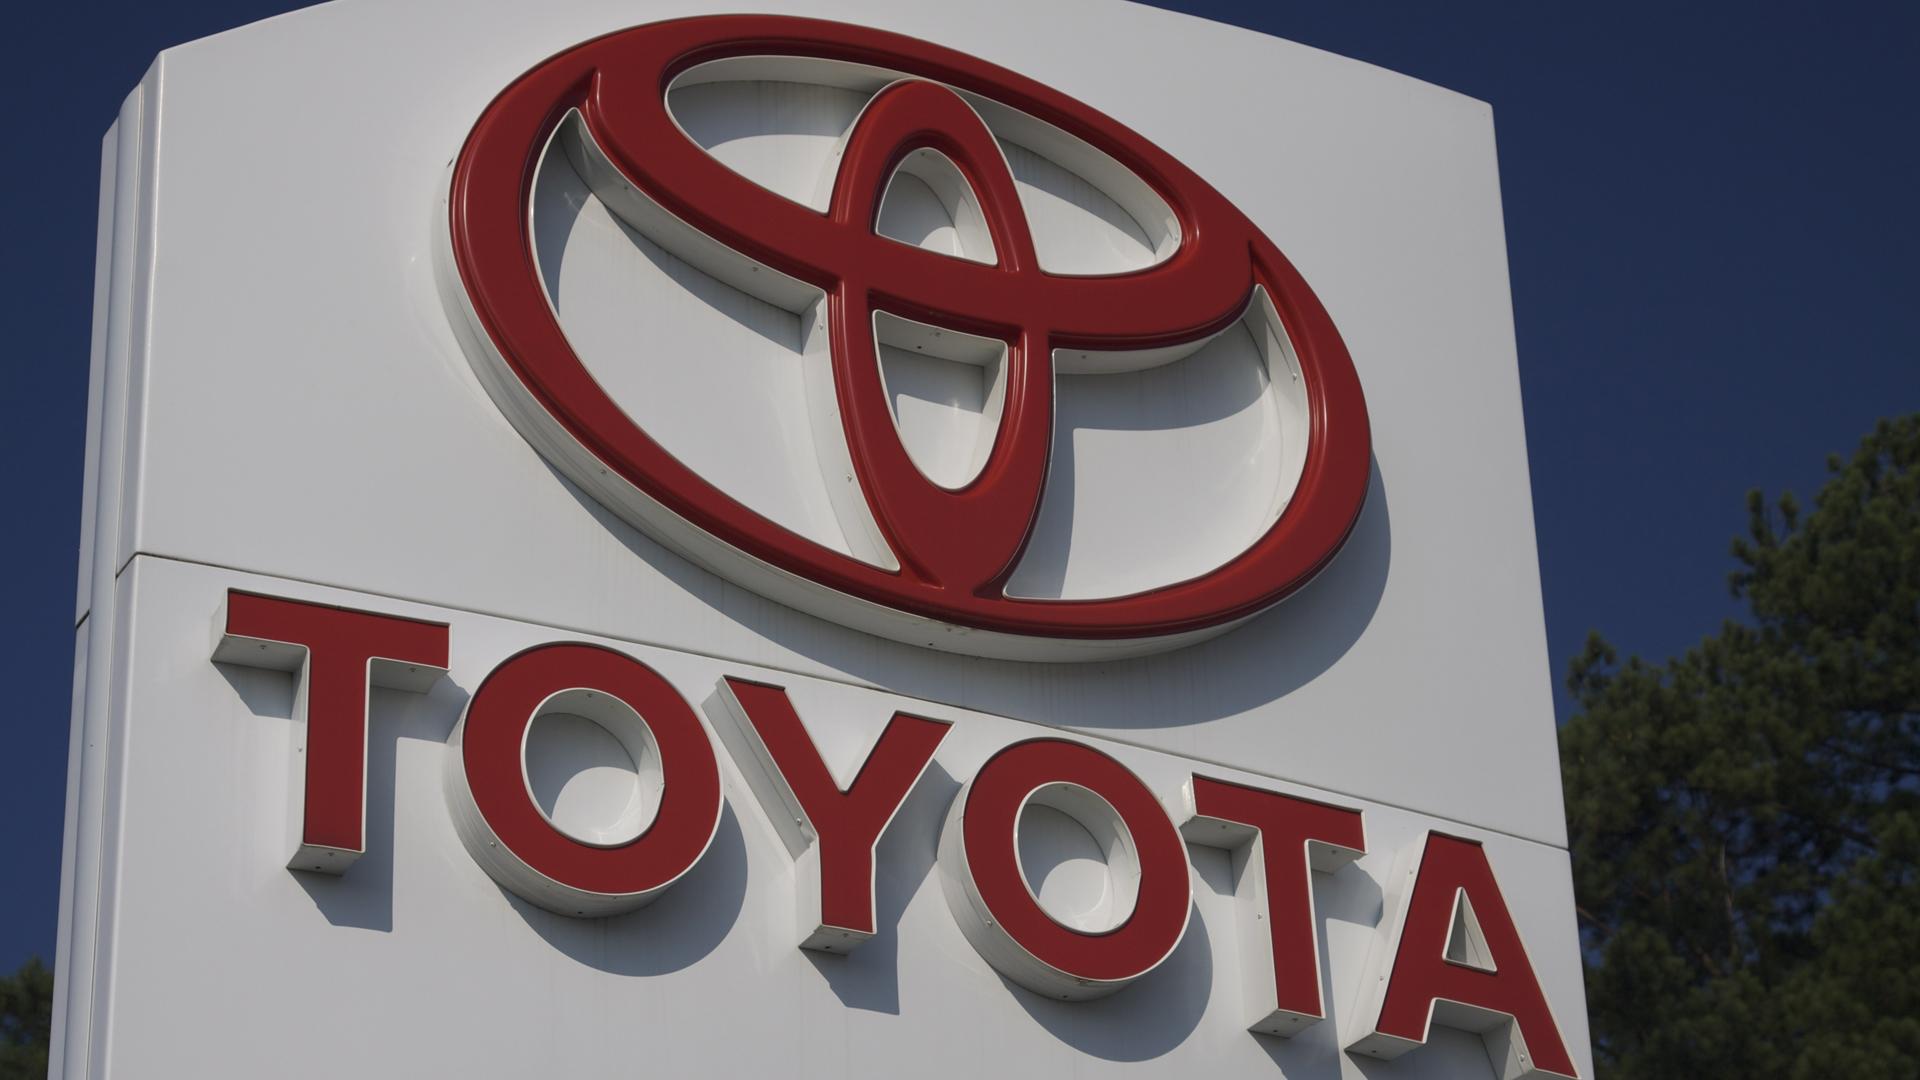 ToyotaRecall